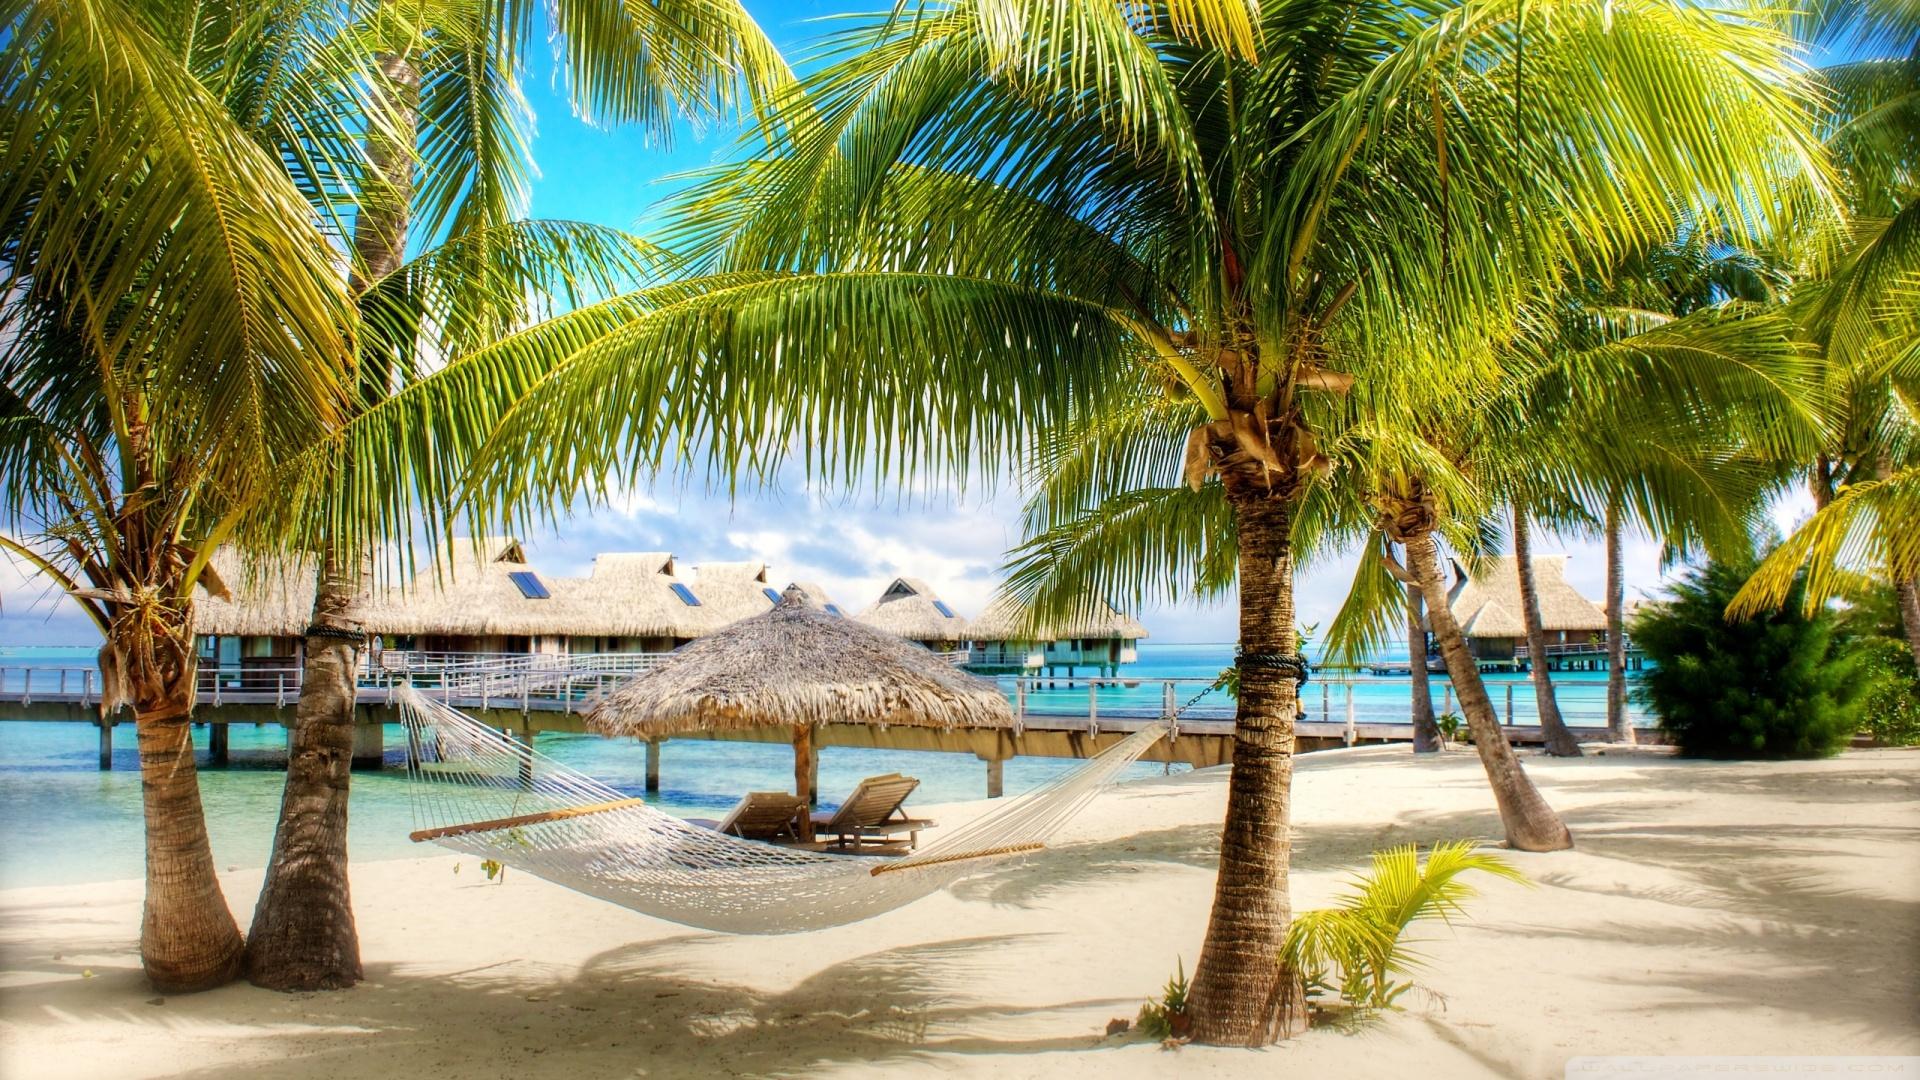 Tropical Beach Resort Wallpaper 1920x1080 Tropical Beach Resort 1920x1080